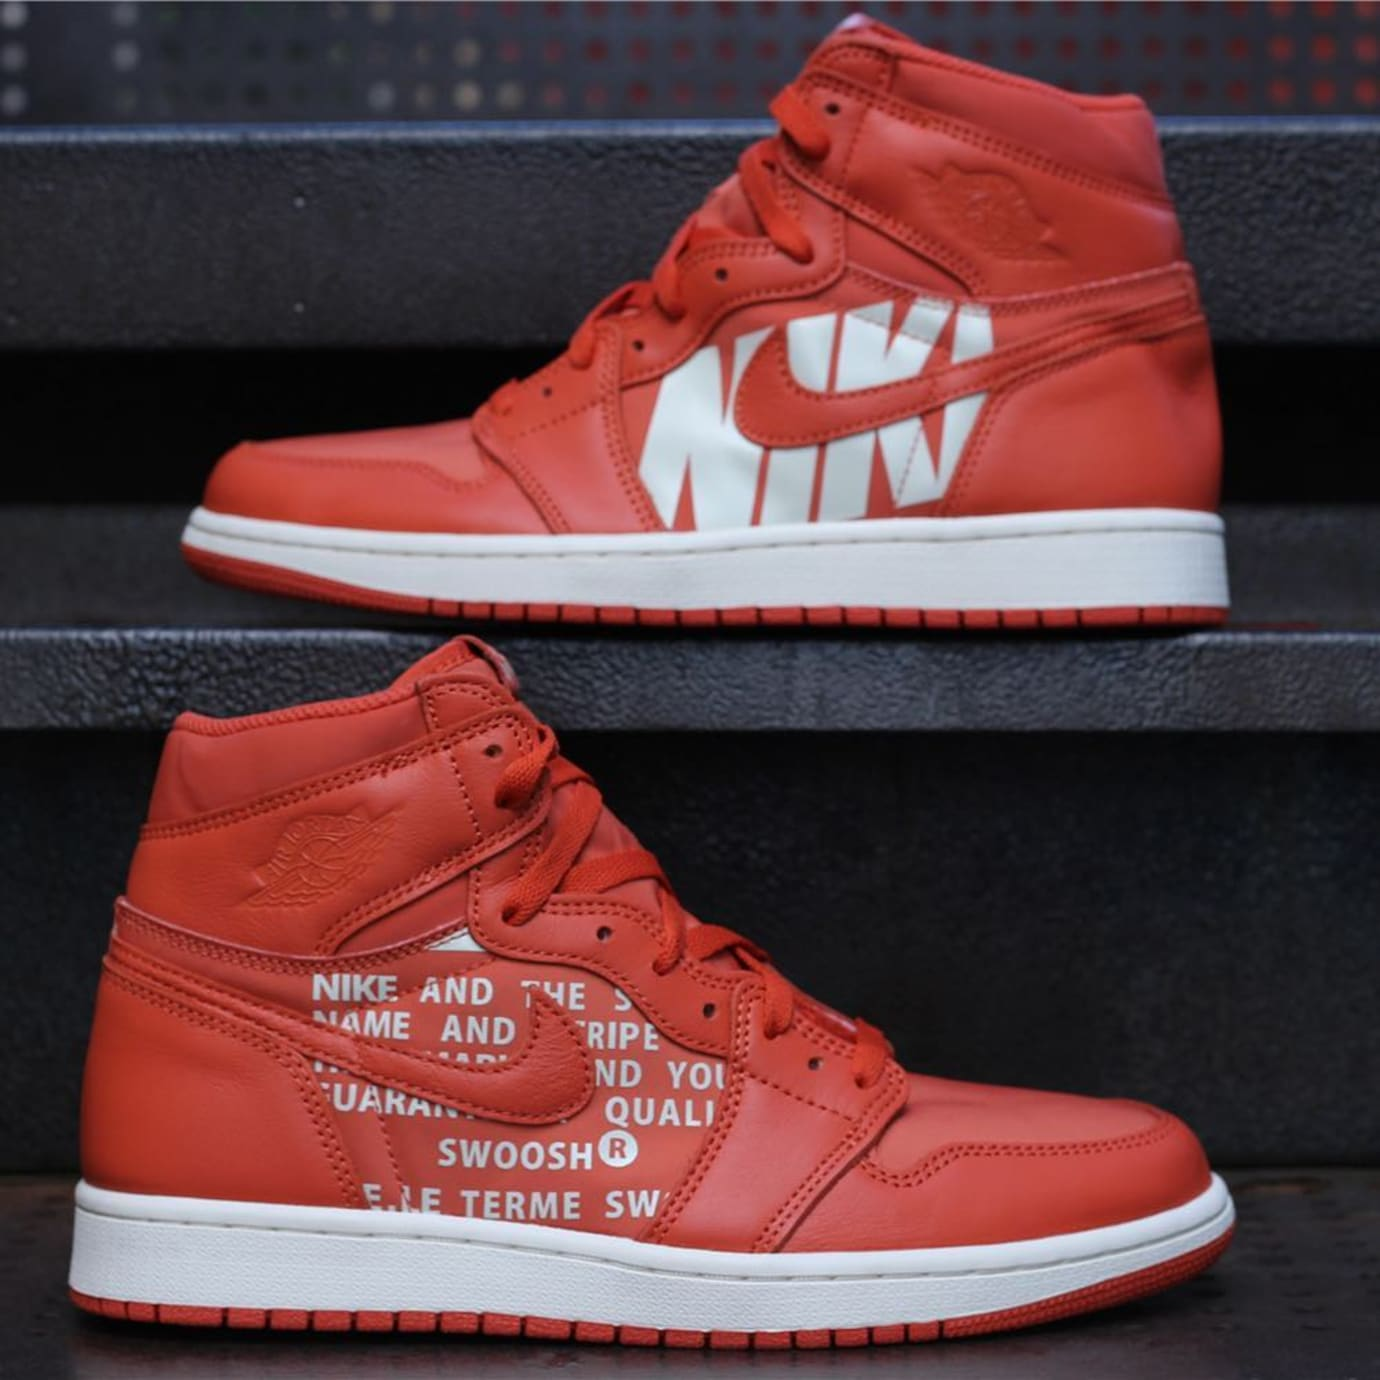 2ba3e854c52296 Air Jordan 1 Orange Nike Swoosh Release Date Side